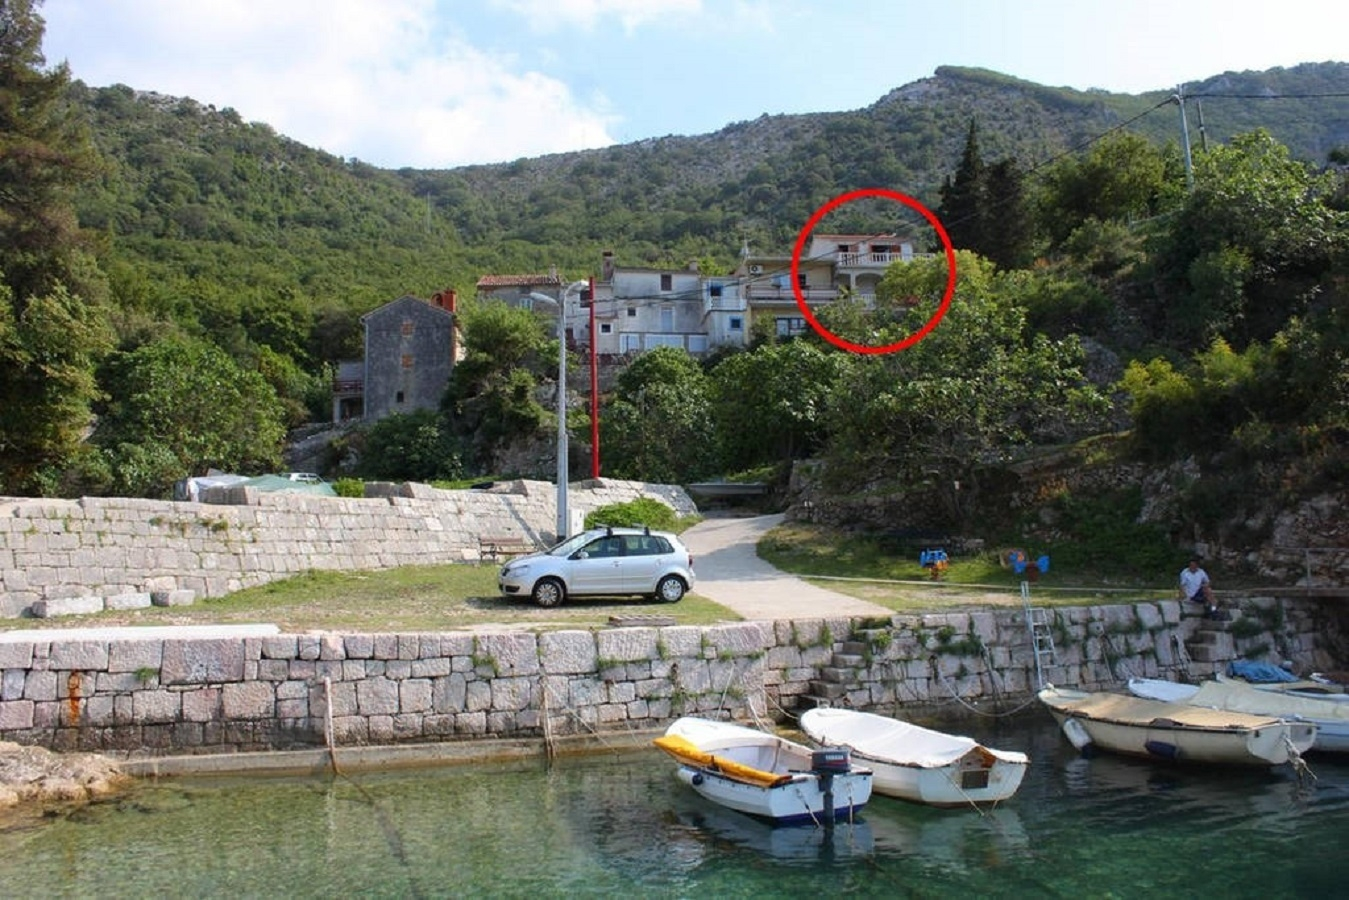 Appartement de vacances BT A2(4) - Merag (769321), Merag, Île de Cres, Kvarner, Croatie, image 3